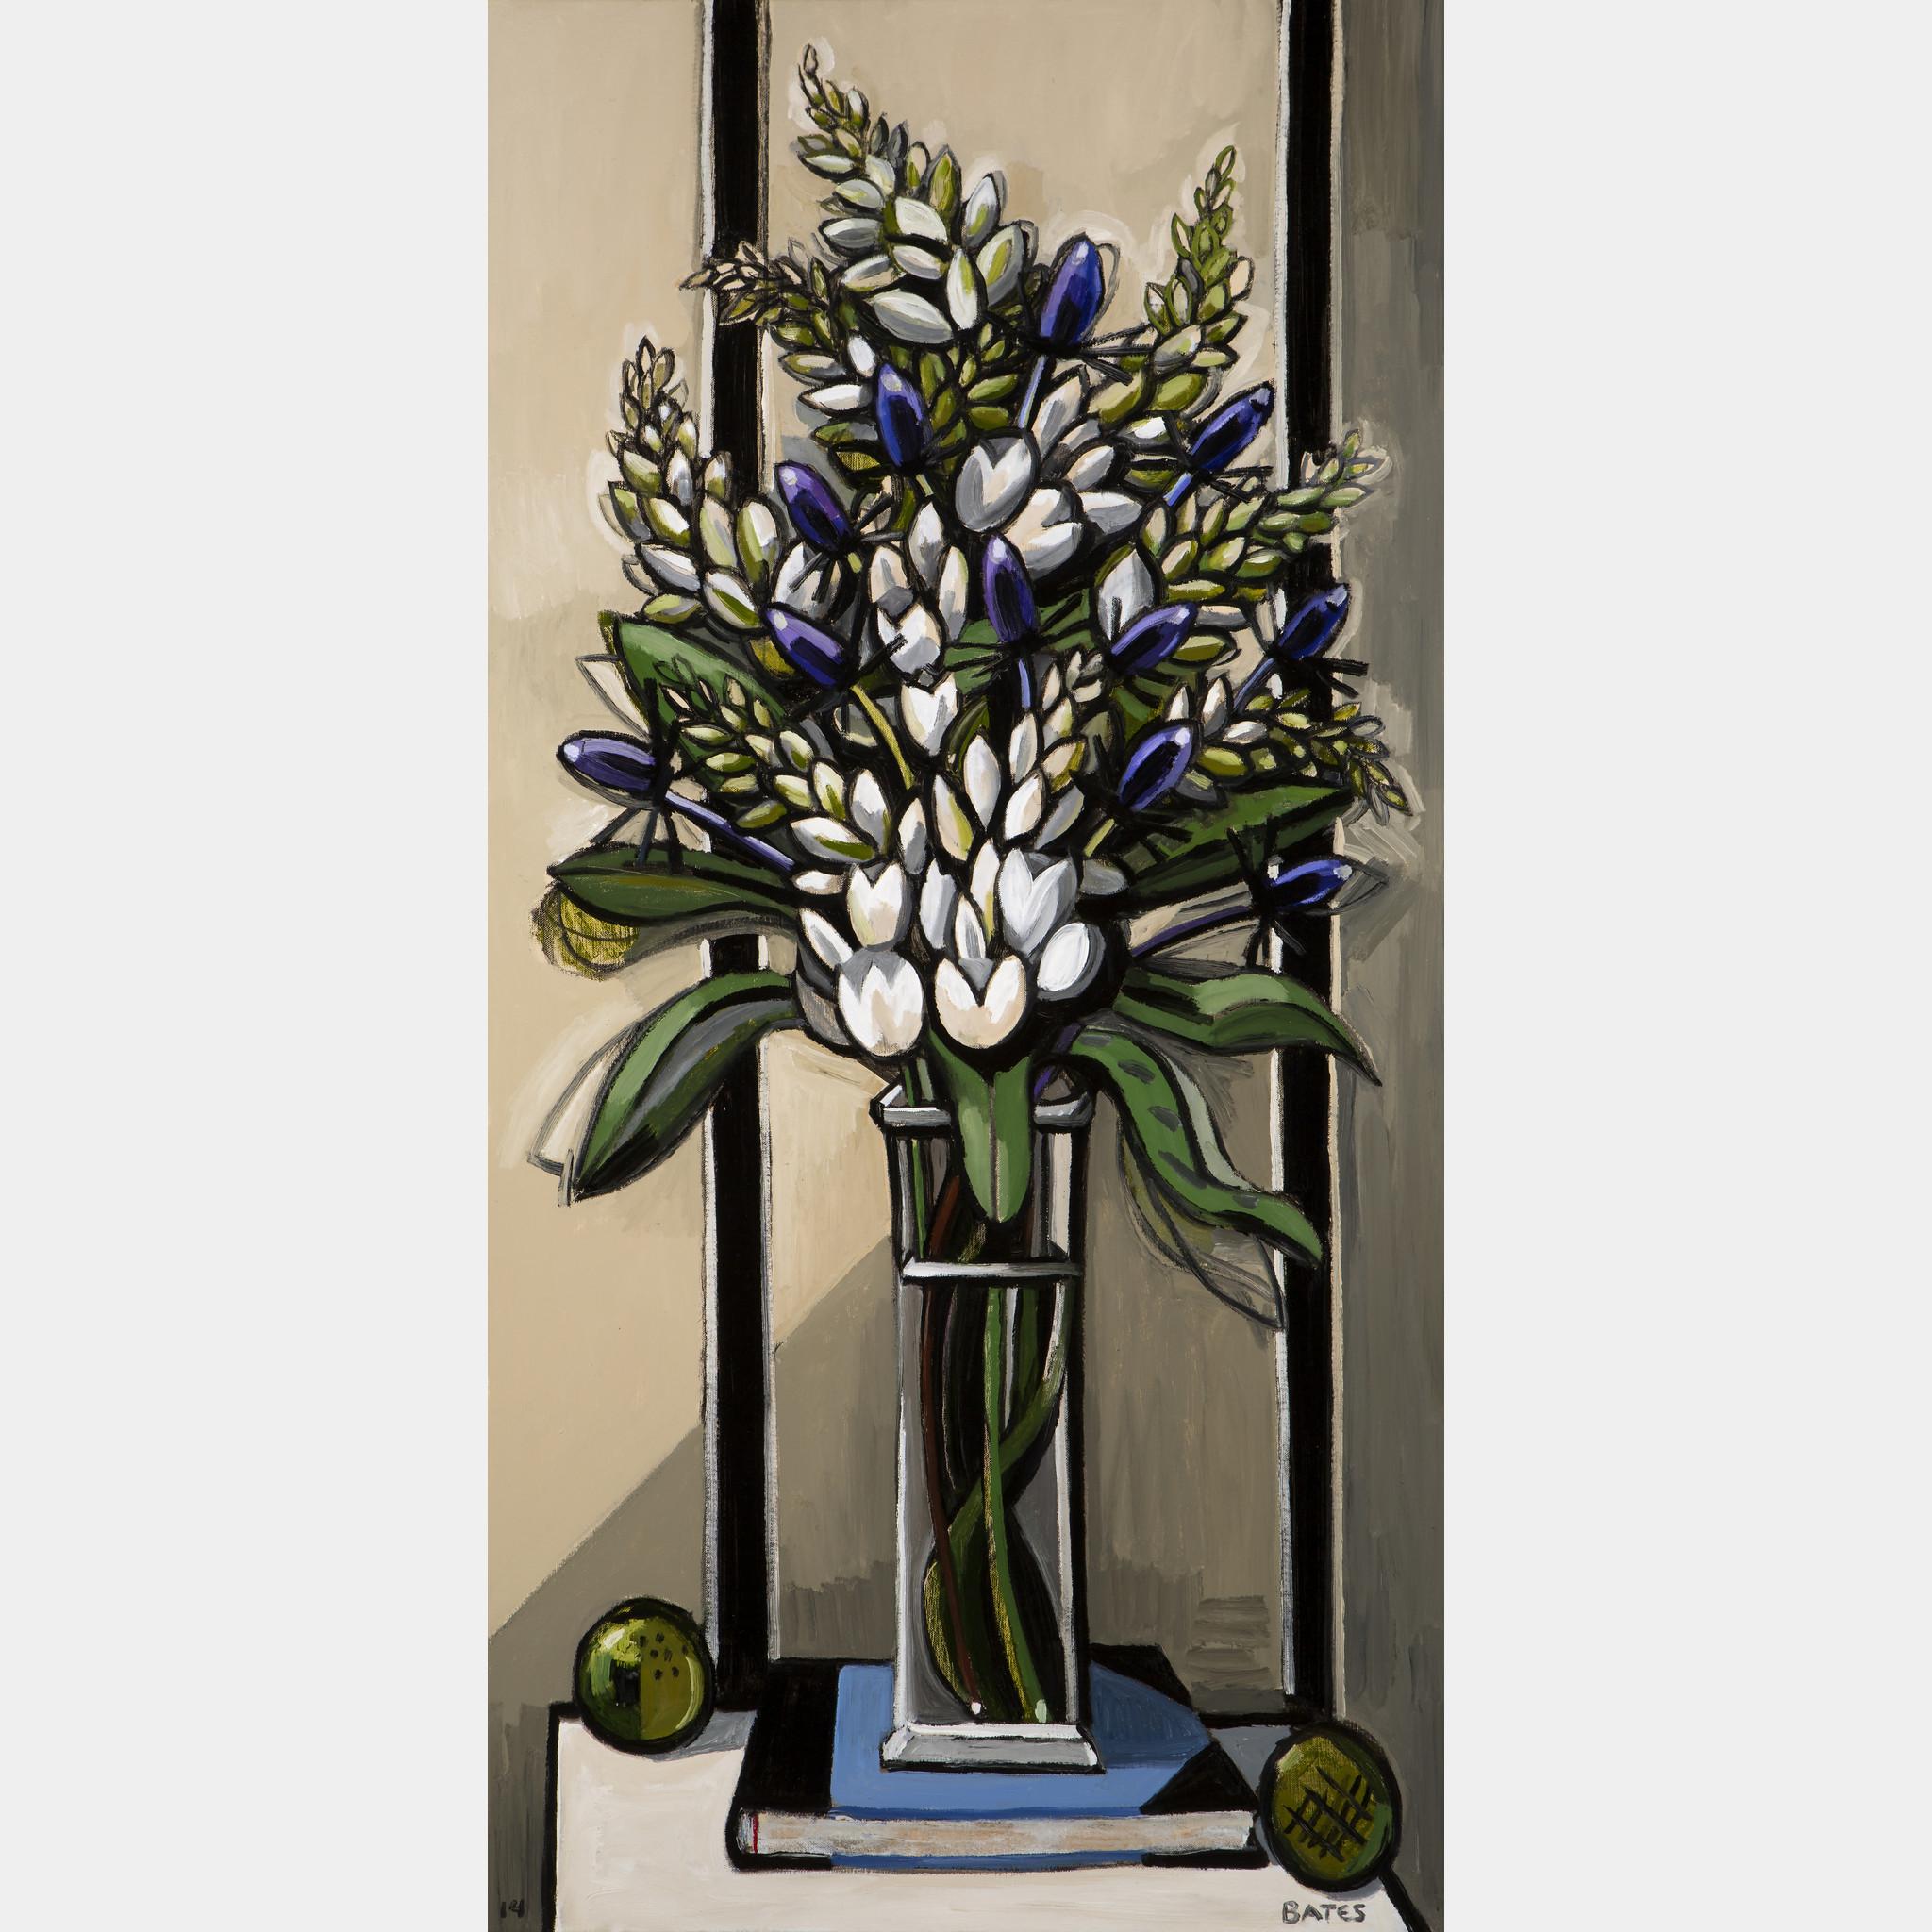 David bates white flowers and thistles art basel mightylinksfo